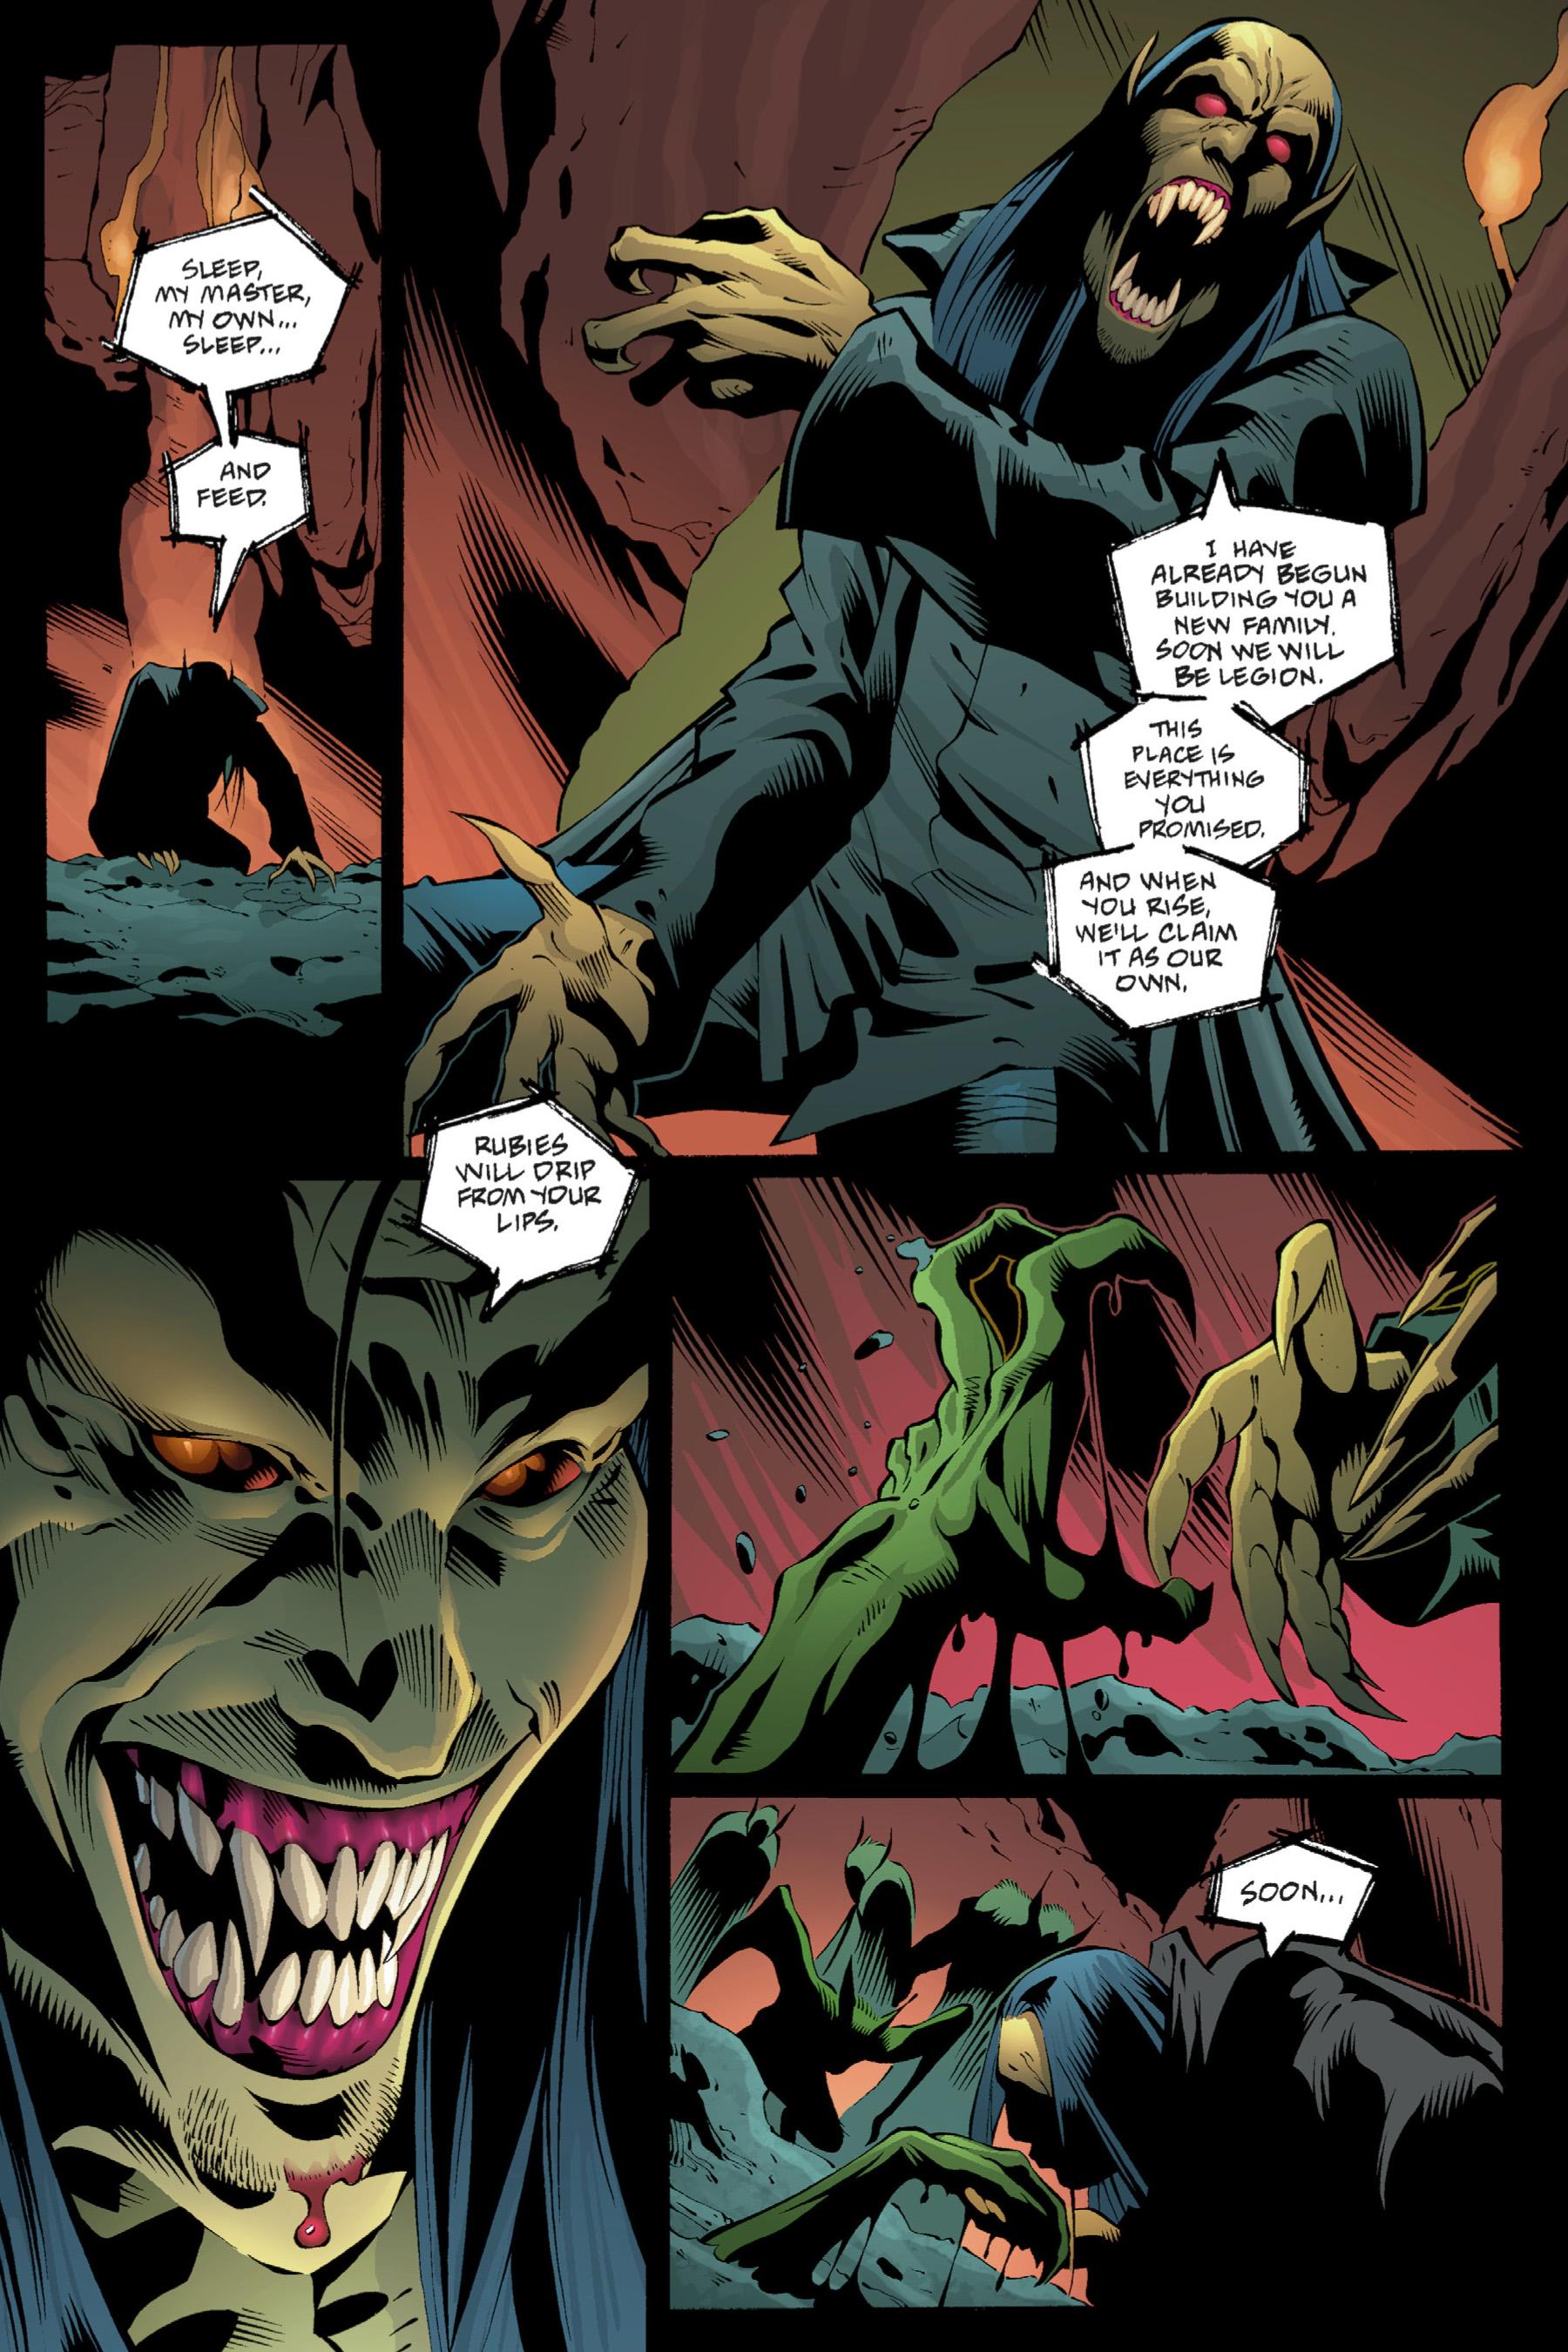 Read online Buffy the Vampire Slayer: Omnibus comic -  Issue # TPB 1 - 45